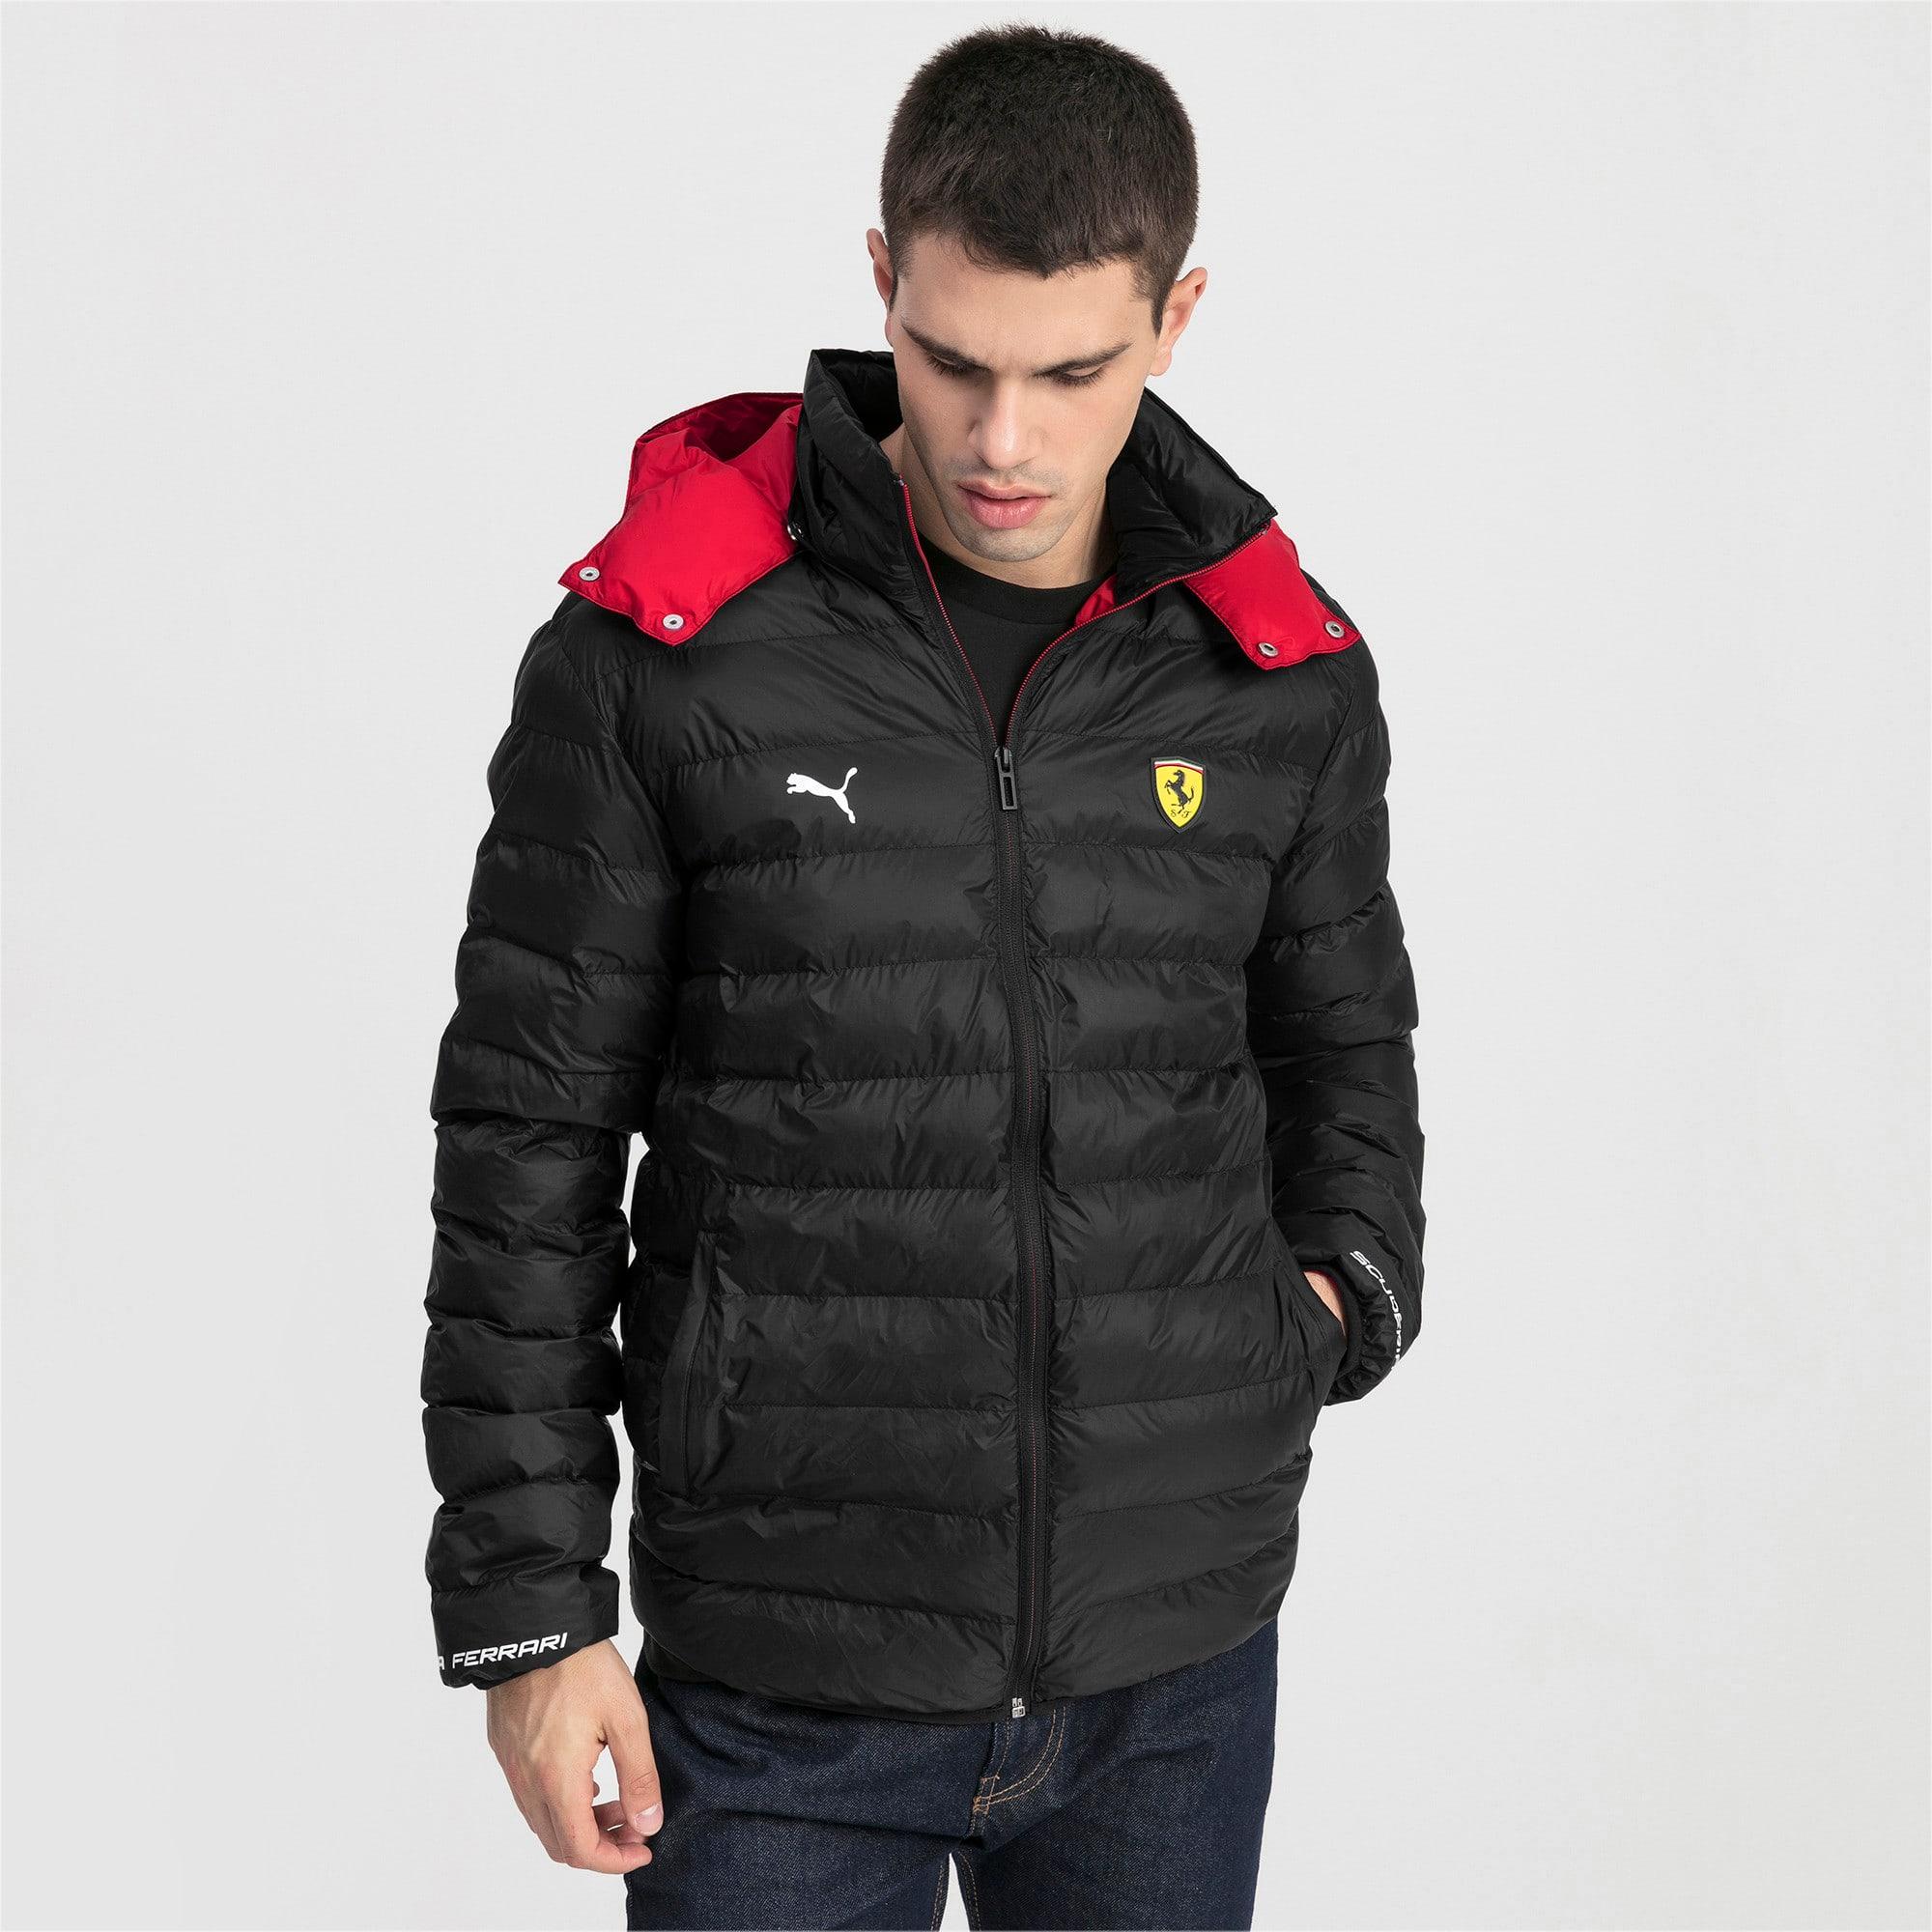 Thumbnail 1 of Ferrari Eco PackLITE Men's Jacket, Puma Black, medium